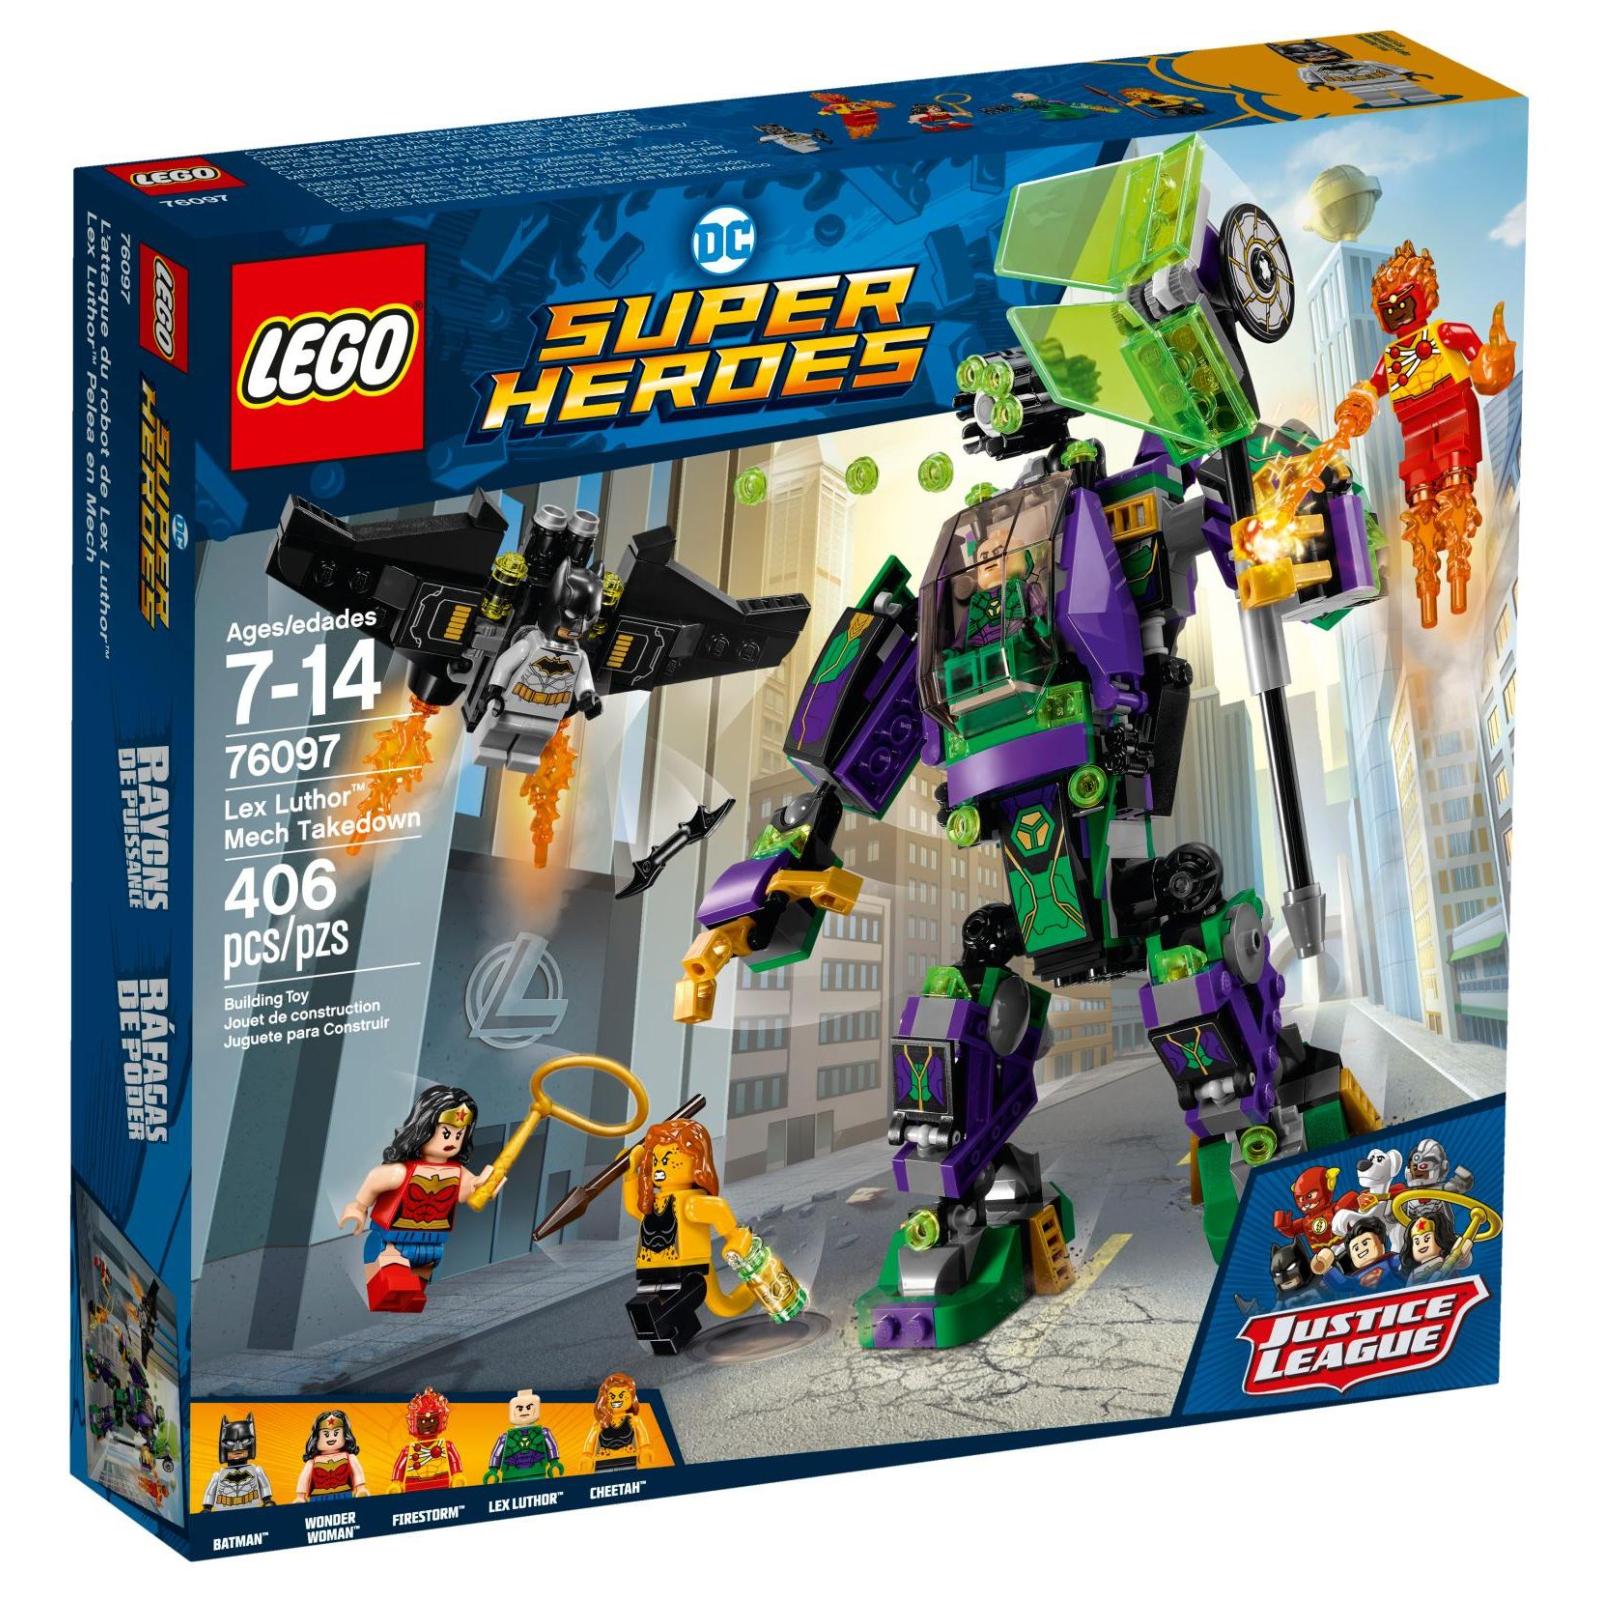 Конструктор LEGO Super Heroes Робоштурм Лекс Лютор (76097)